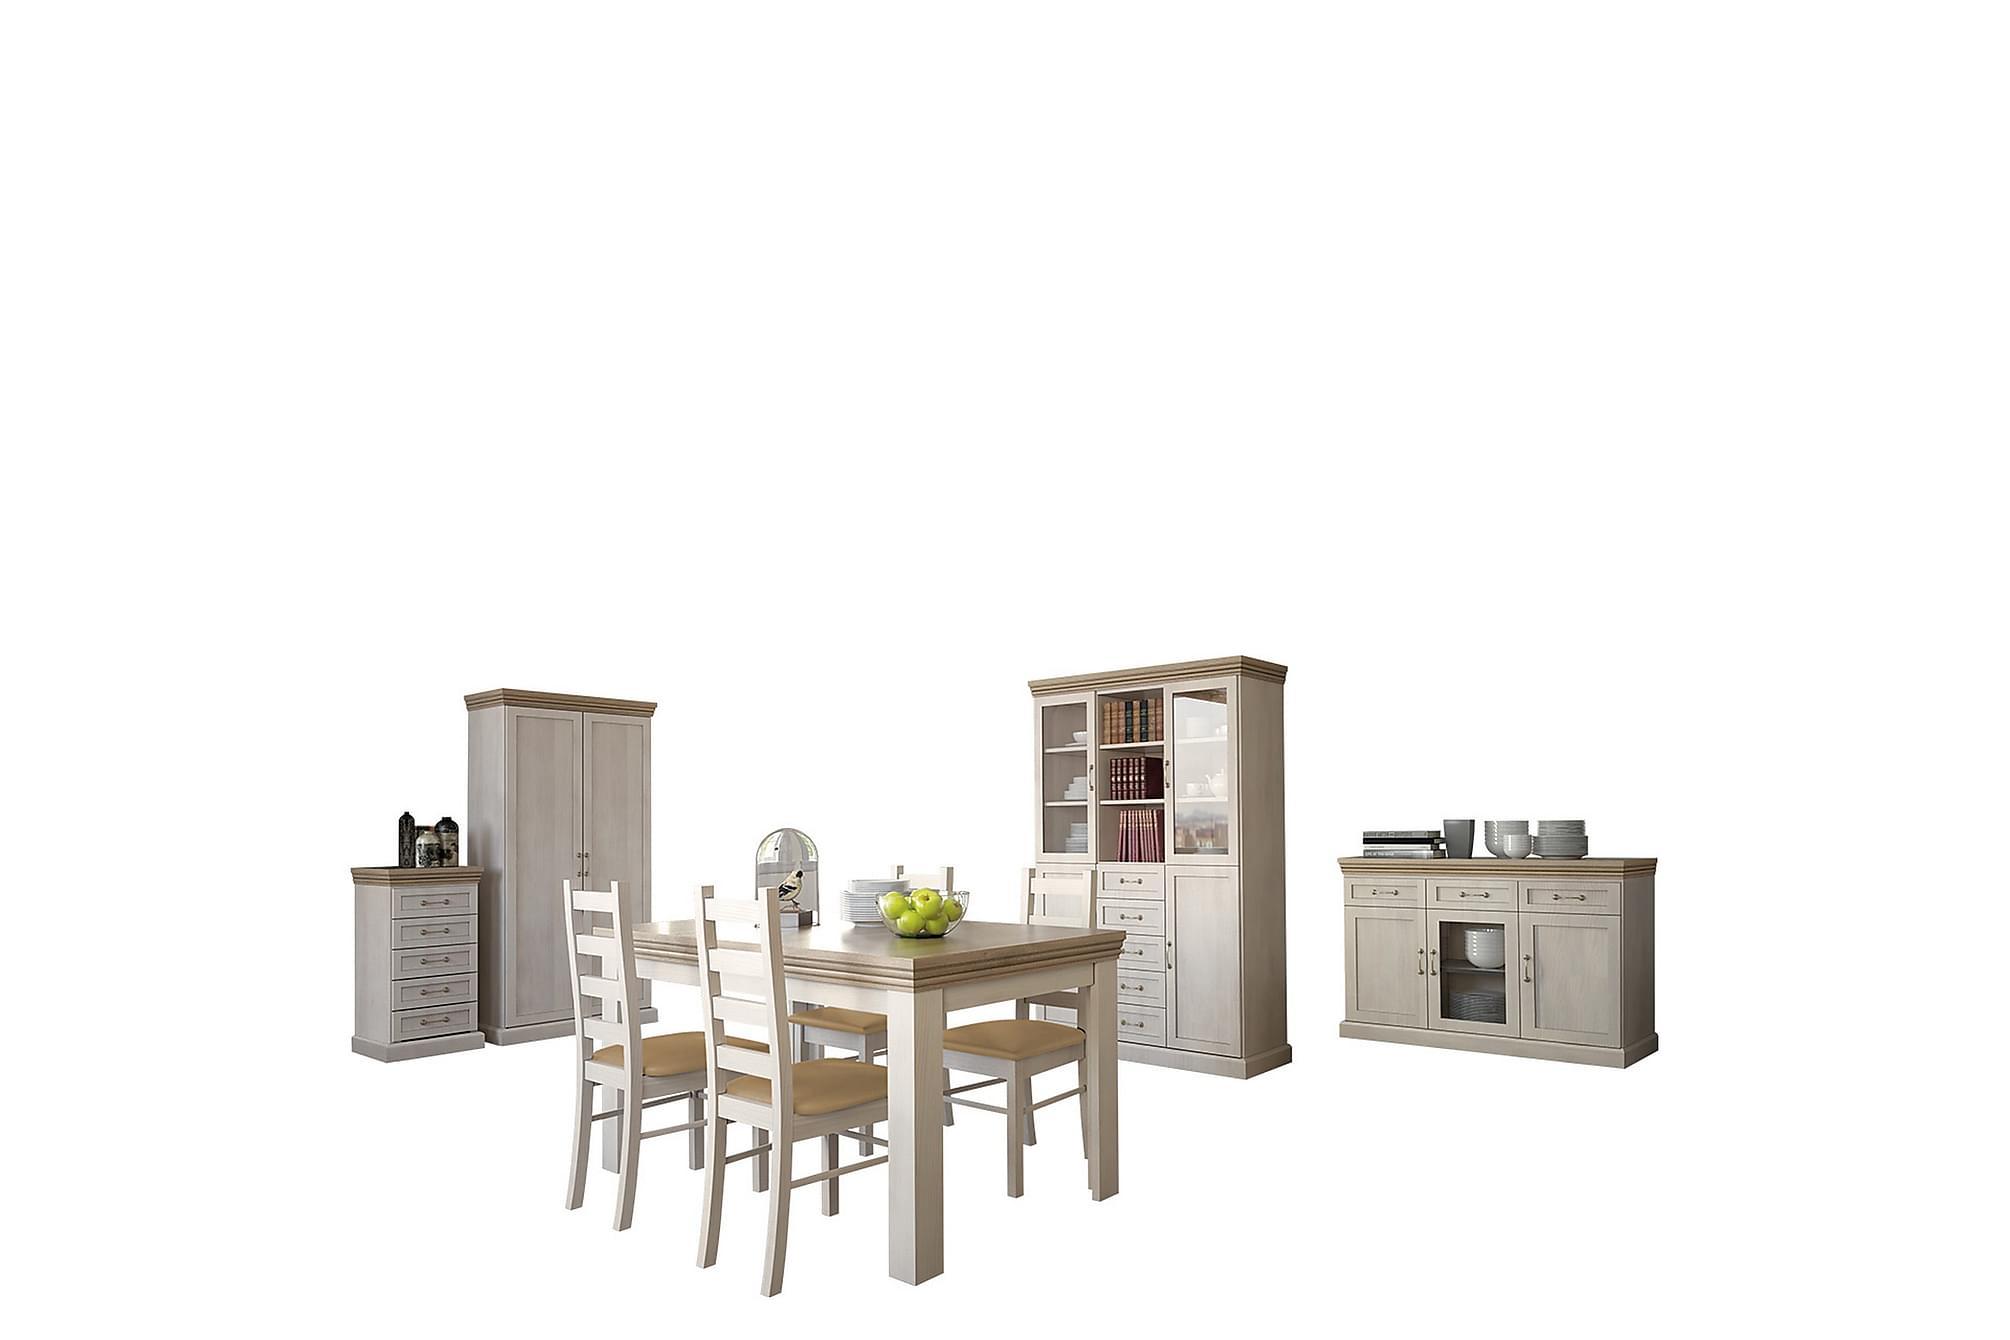 ROYAL Vardagsrumsset Tall/Ek, Möbelset för kök & matplats